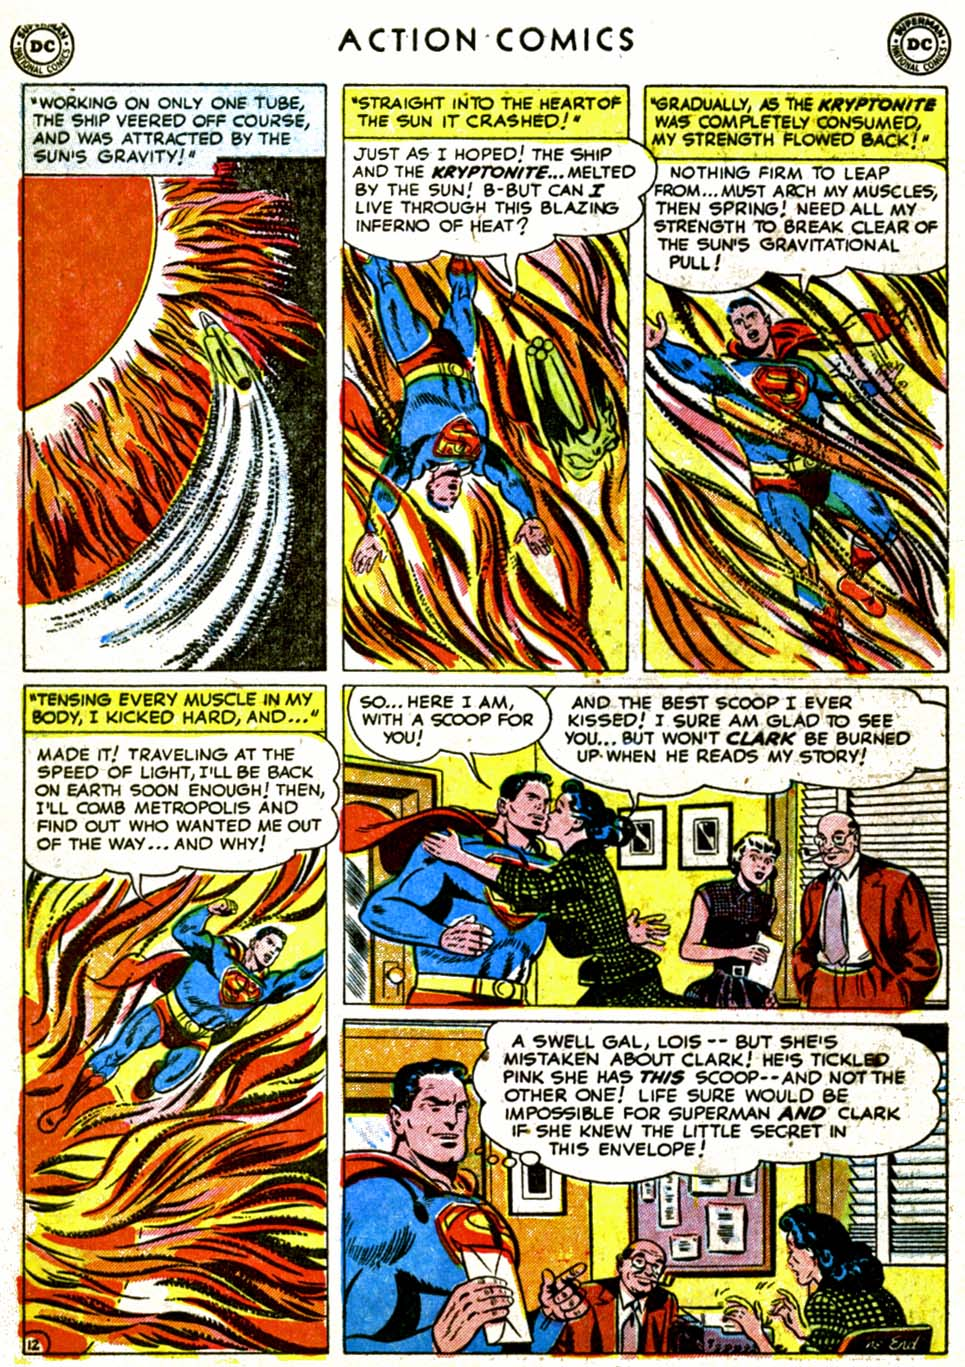 Action Comics (1938) 161 Page 13